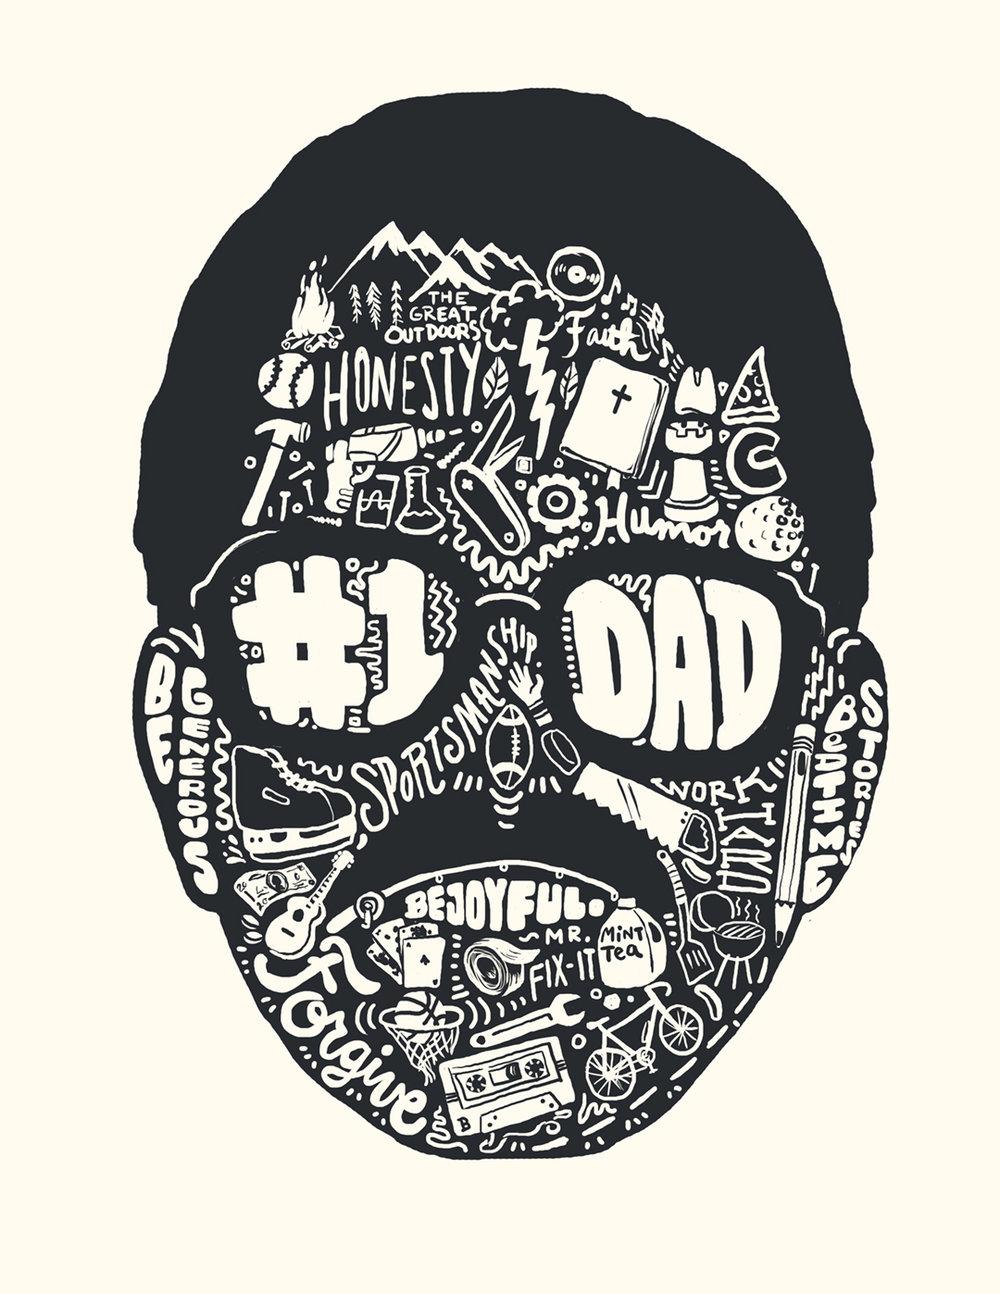 525_June15_FathersDay_medium.jpg